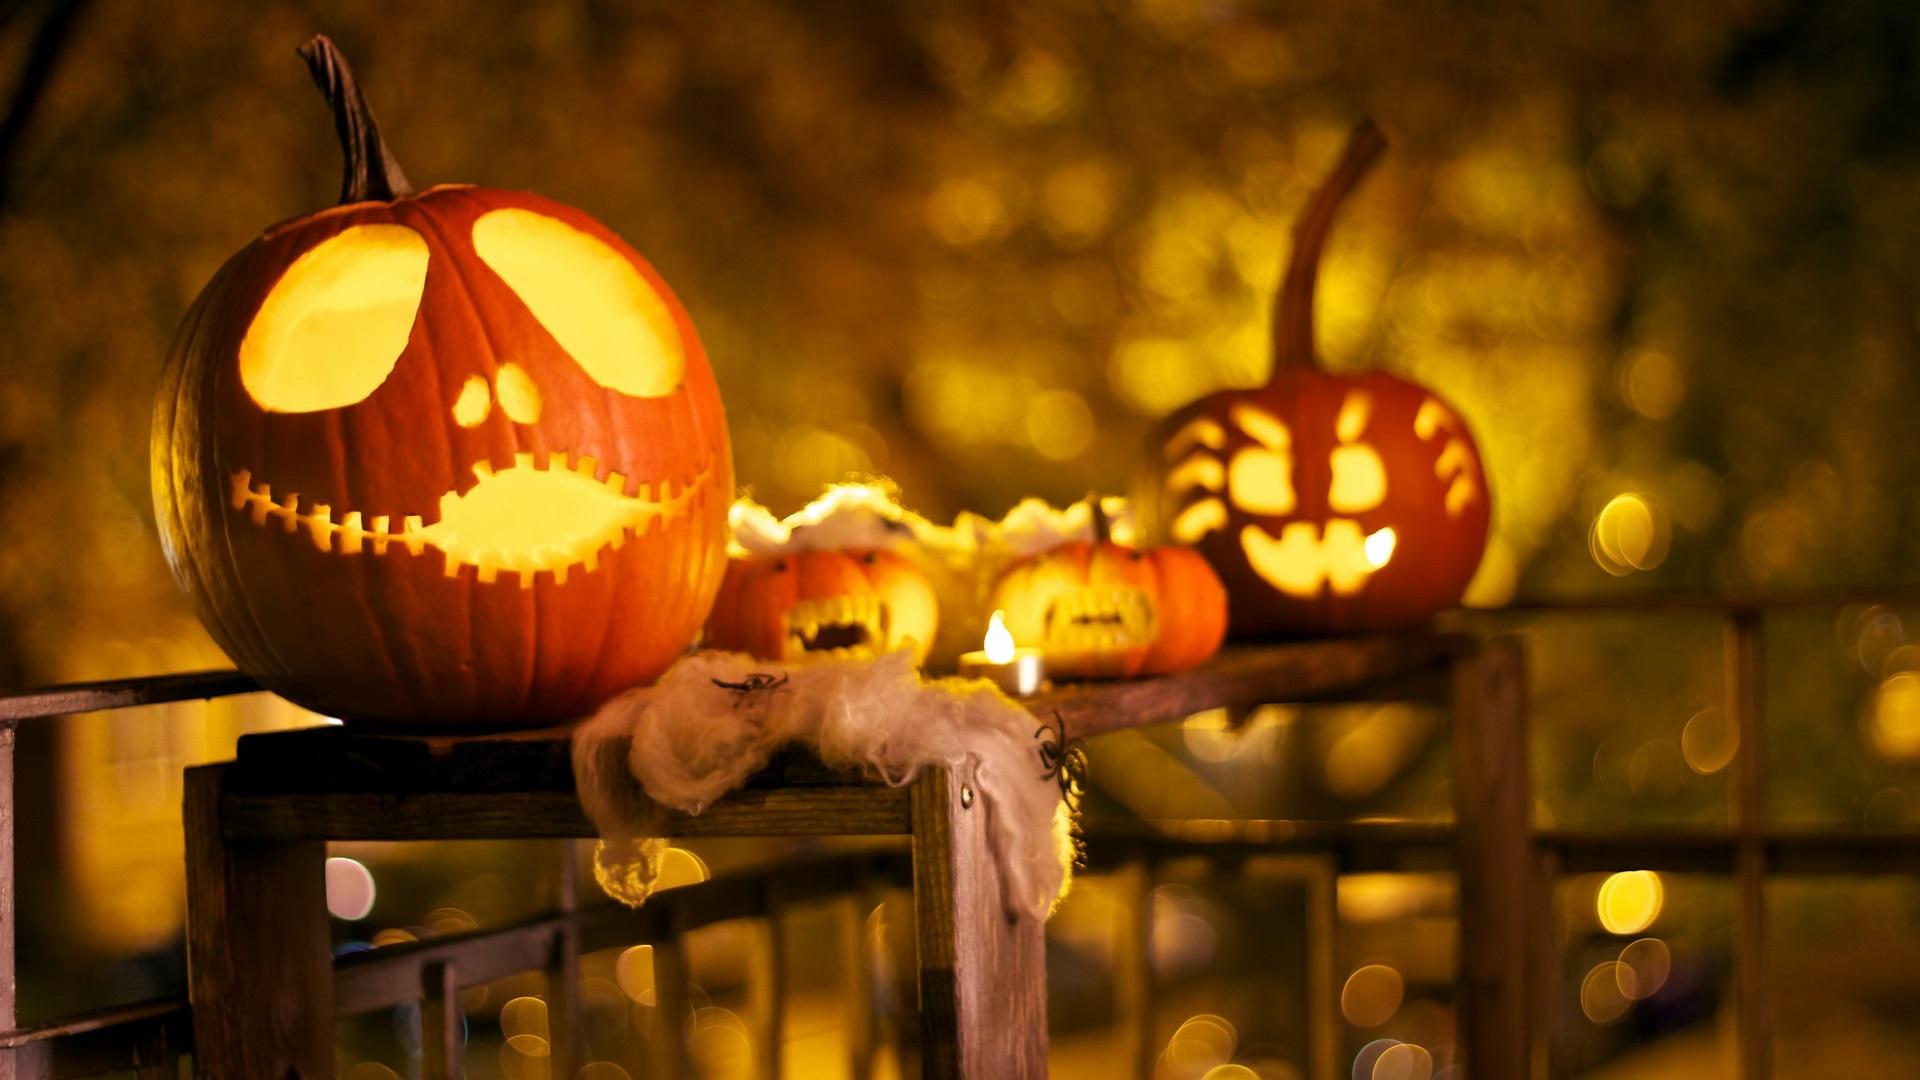 15 Wonderful HD Halloween Wallpapers